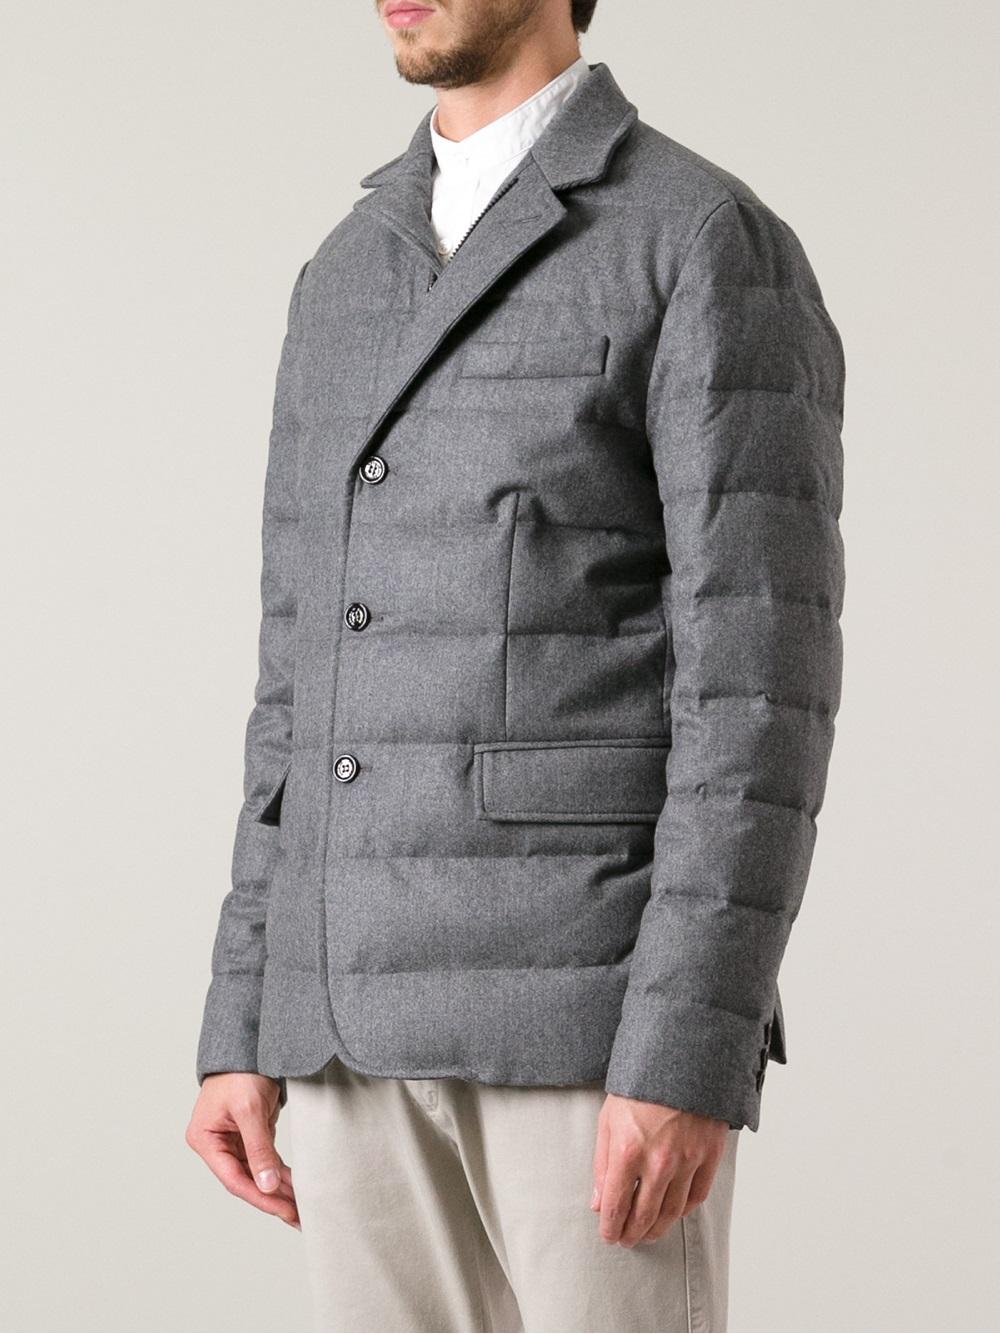 d64e7347a5d5 Lyst - Moncler Rodin Blazer in Gray for Men